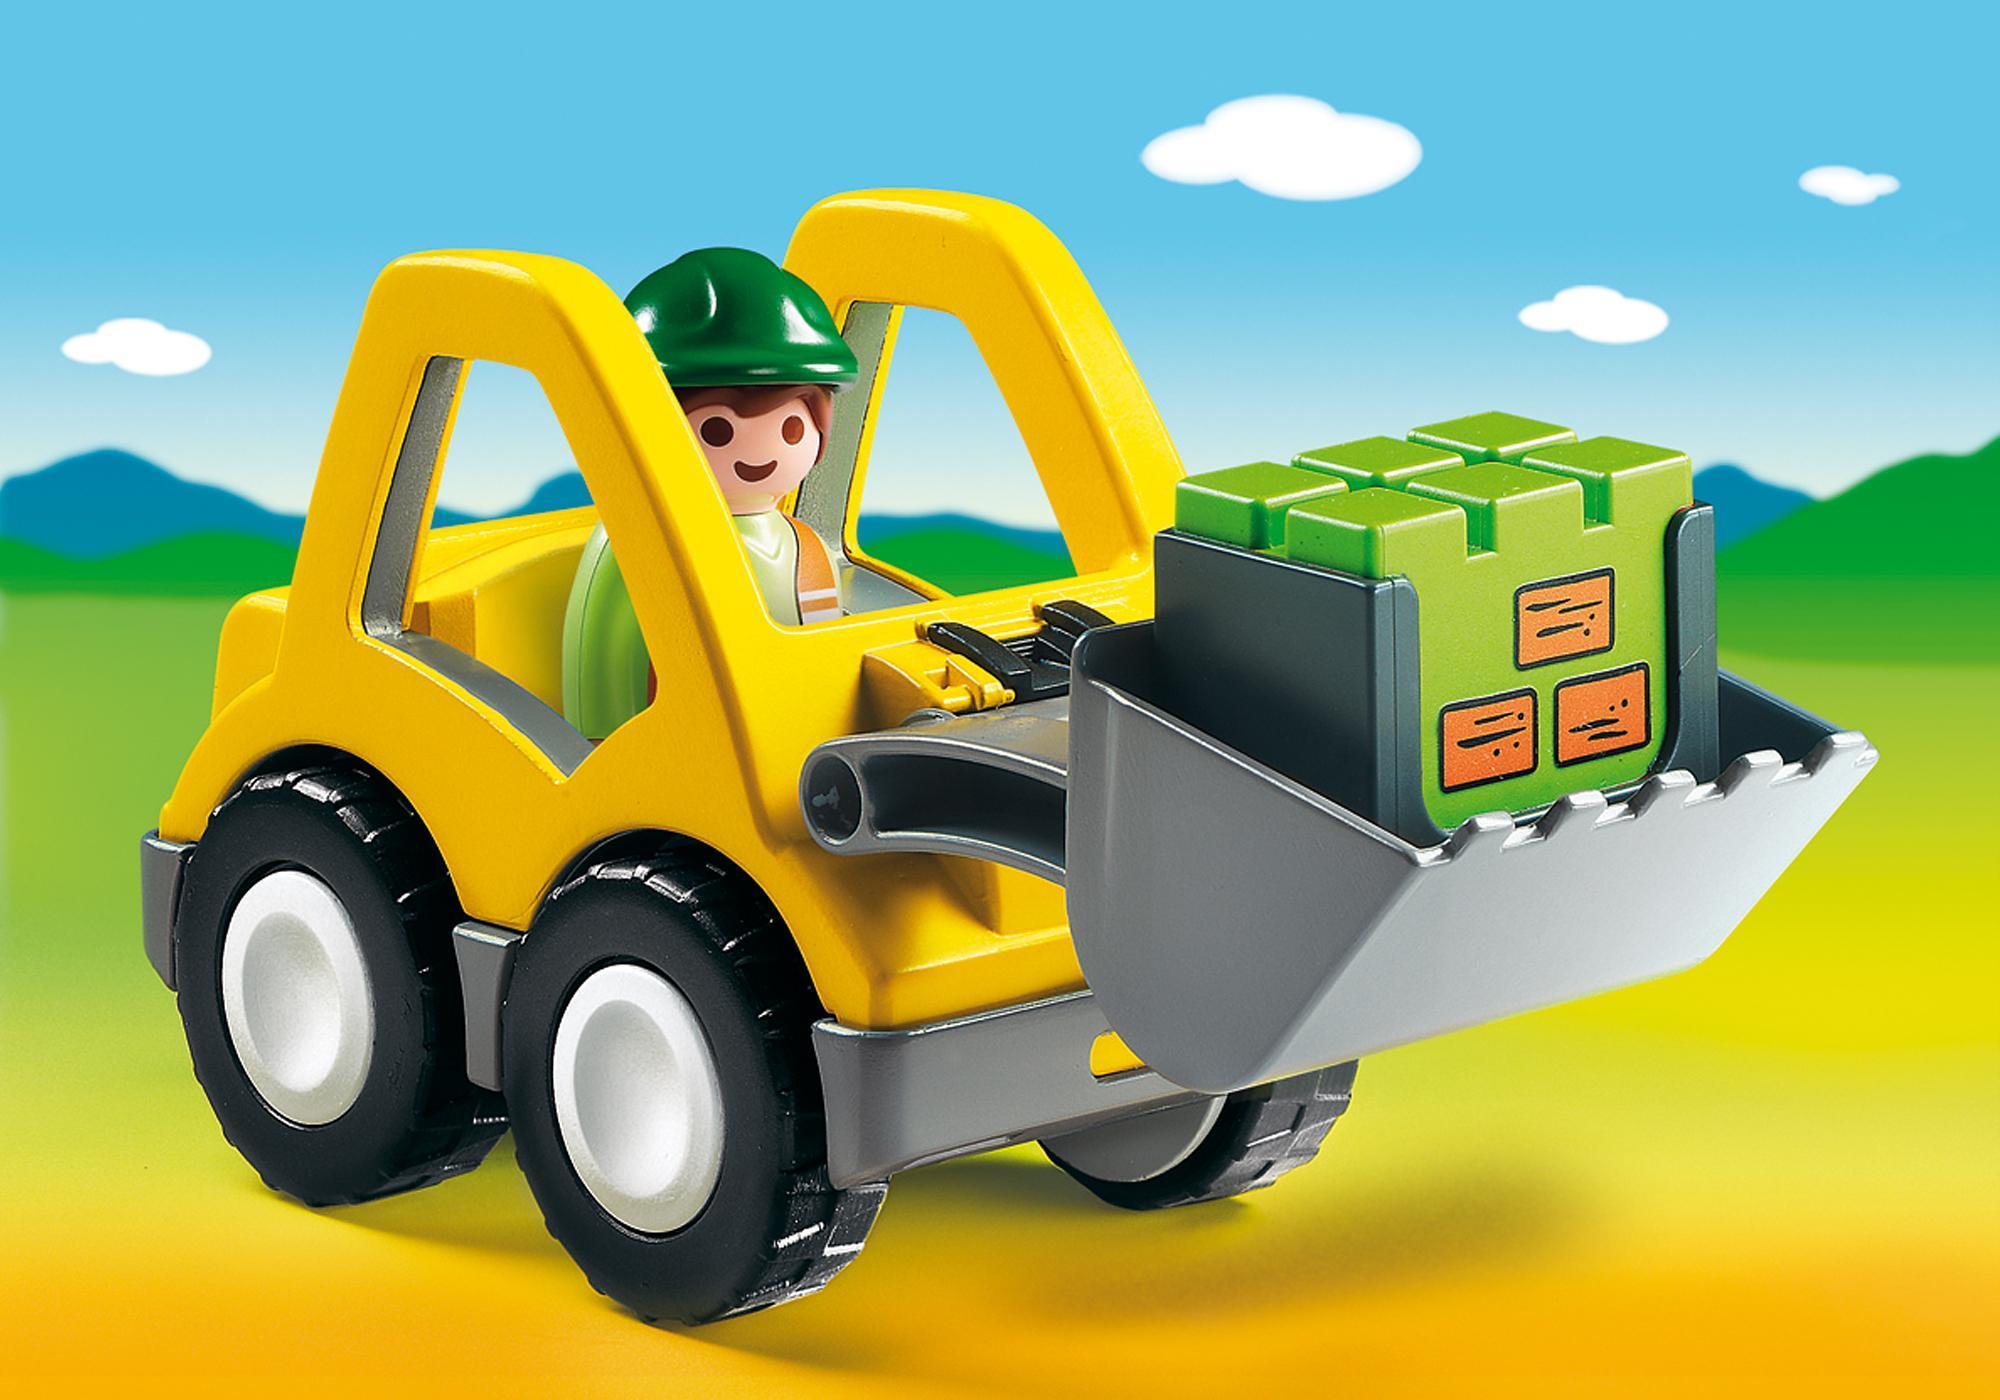 http://media.playmobil.com/i/playmobil/6775_product_detail/1.2.3 Excavator